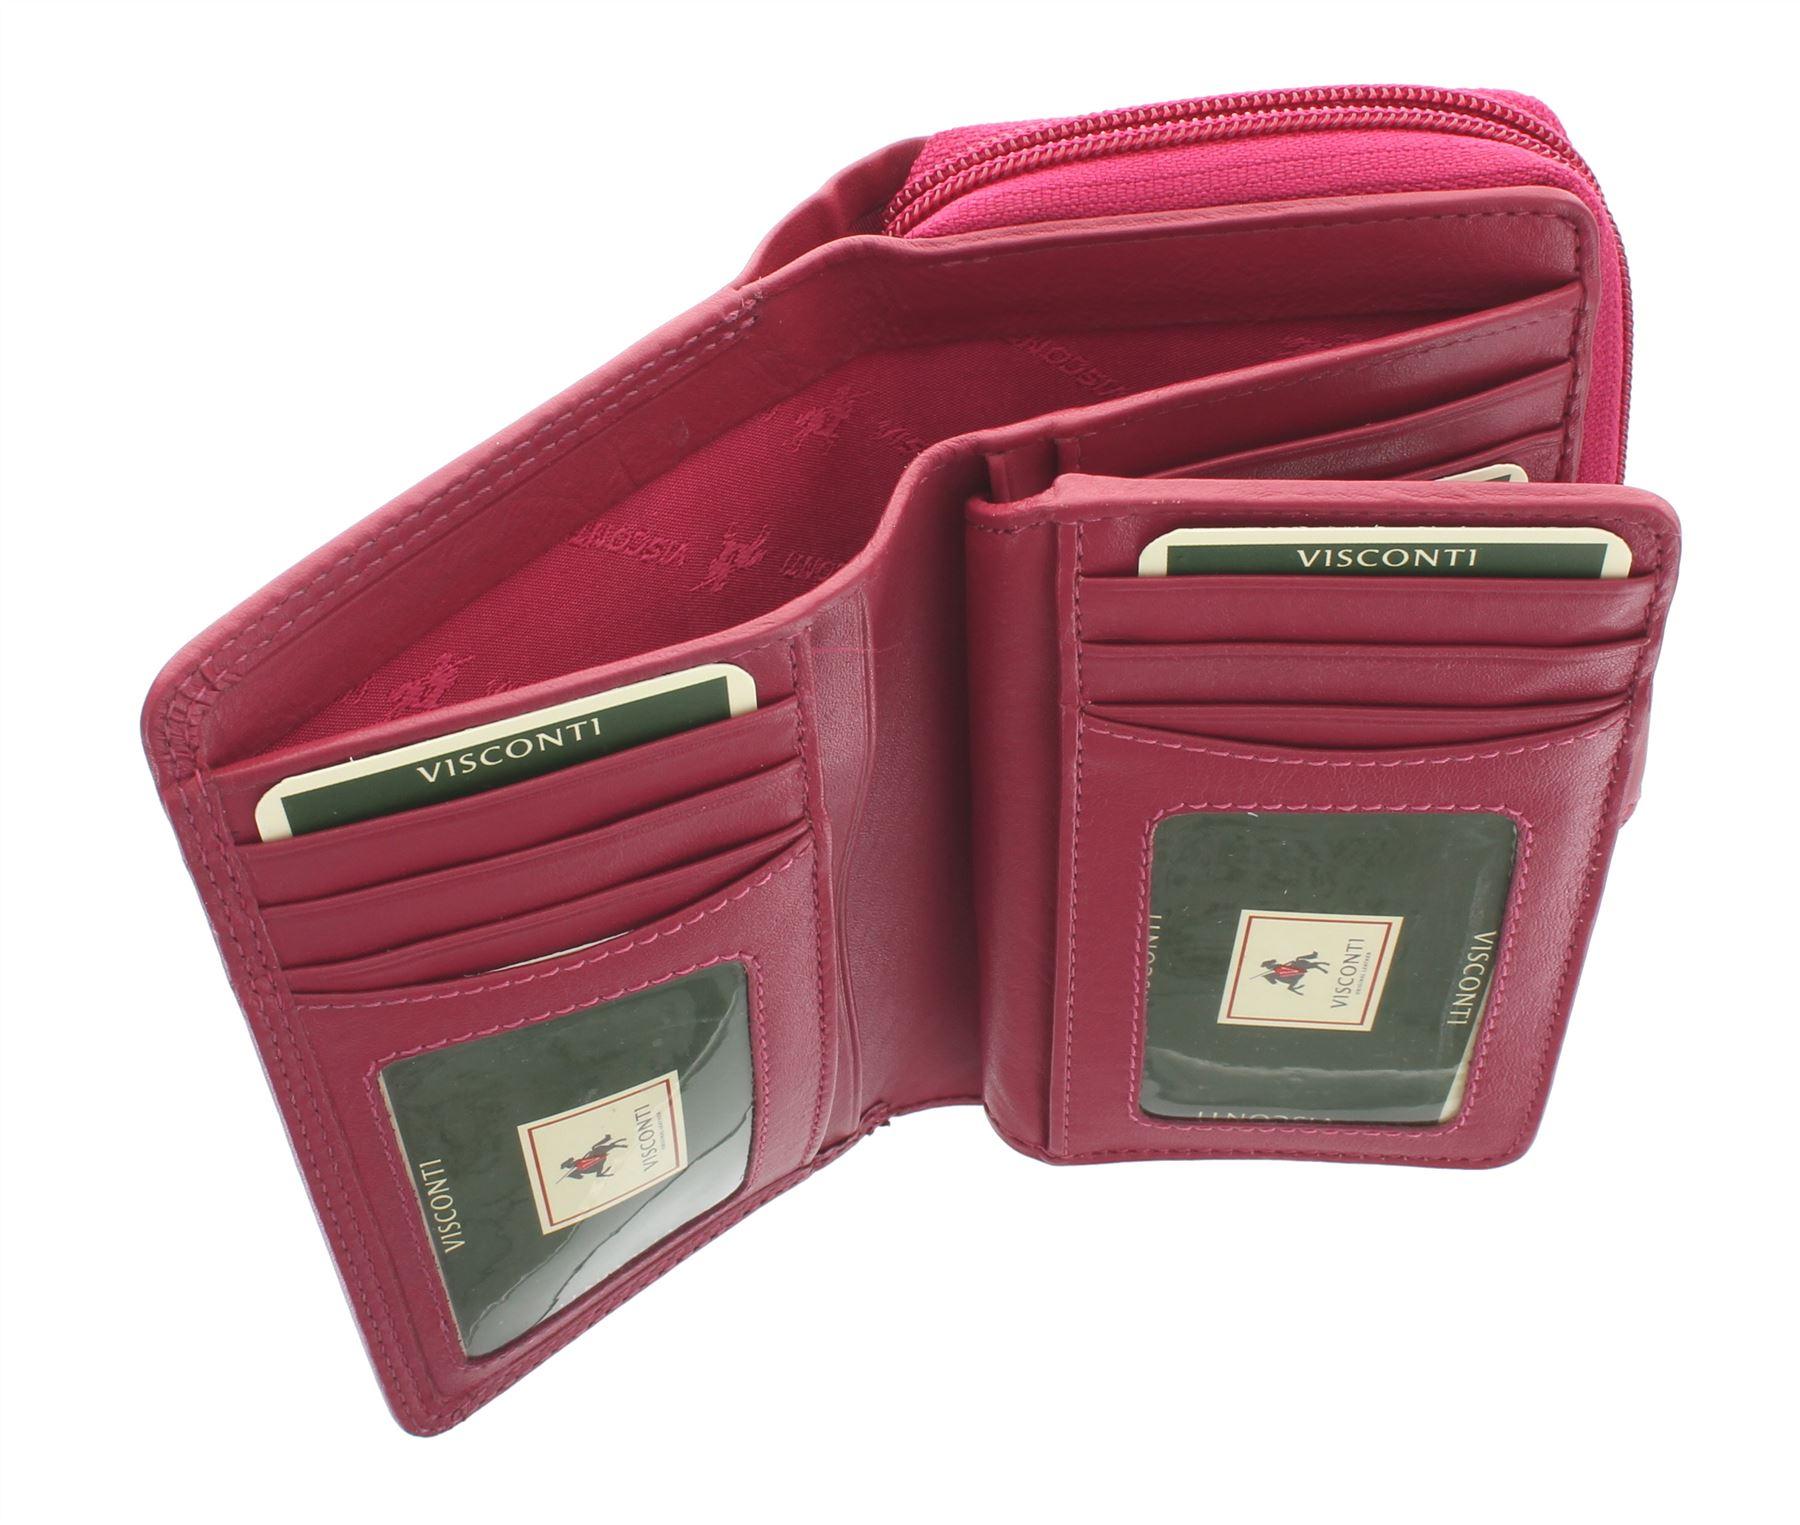 Visconti-Heritage-Collection-MADAME-Leather-Purse-Tab-Closure-RFID-blocking-HT33 miniatura 15